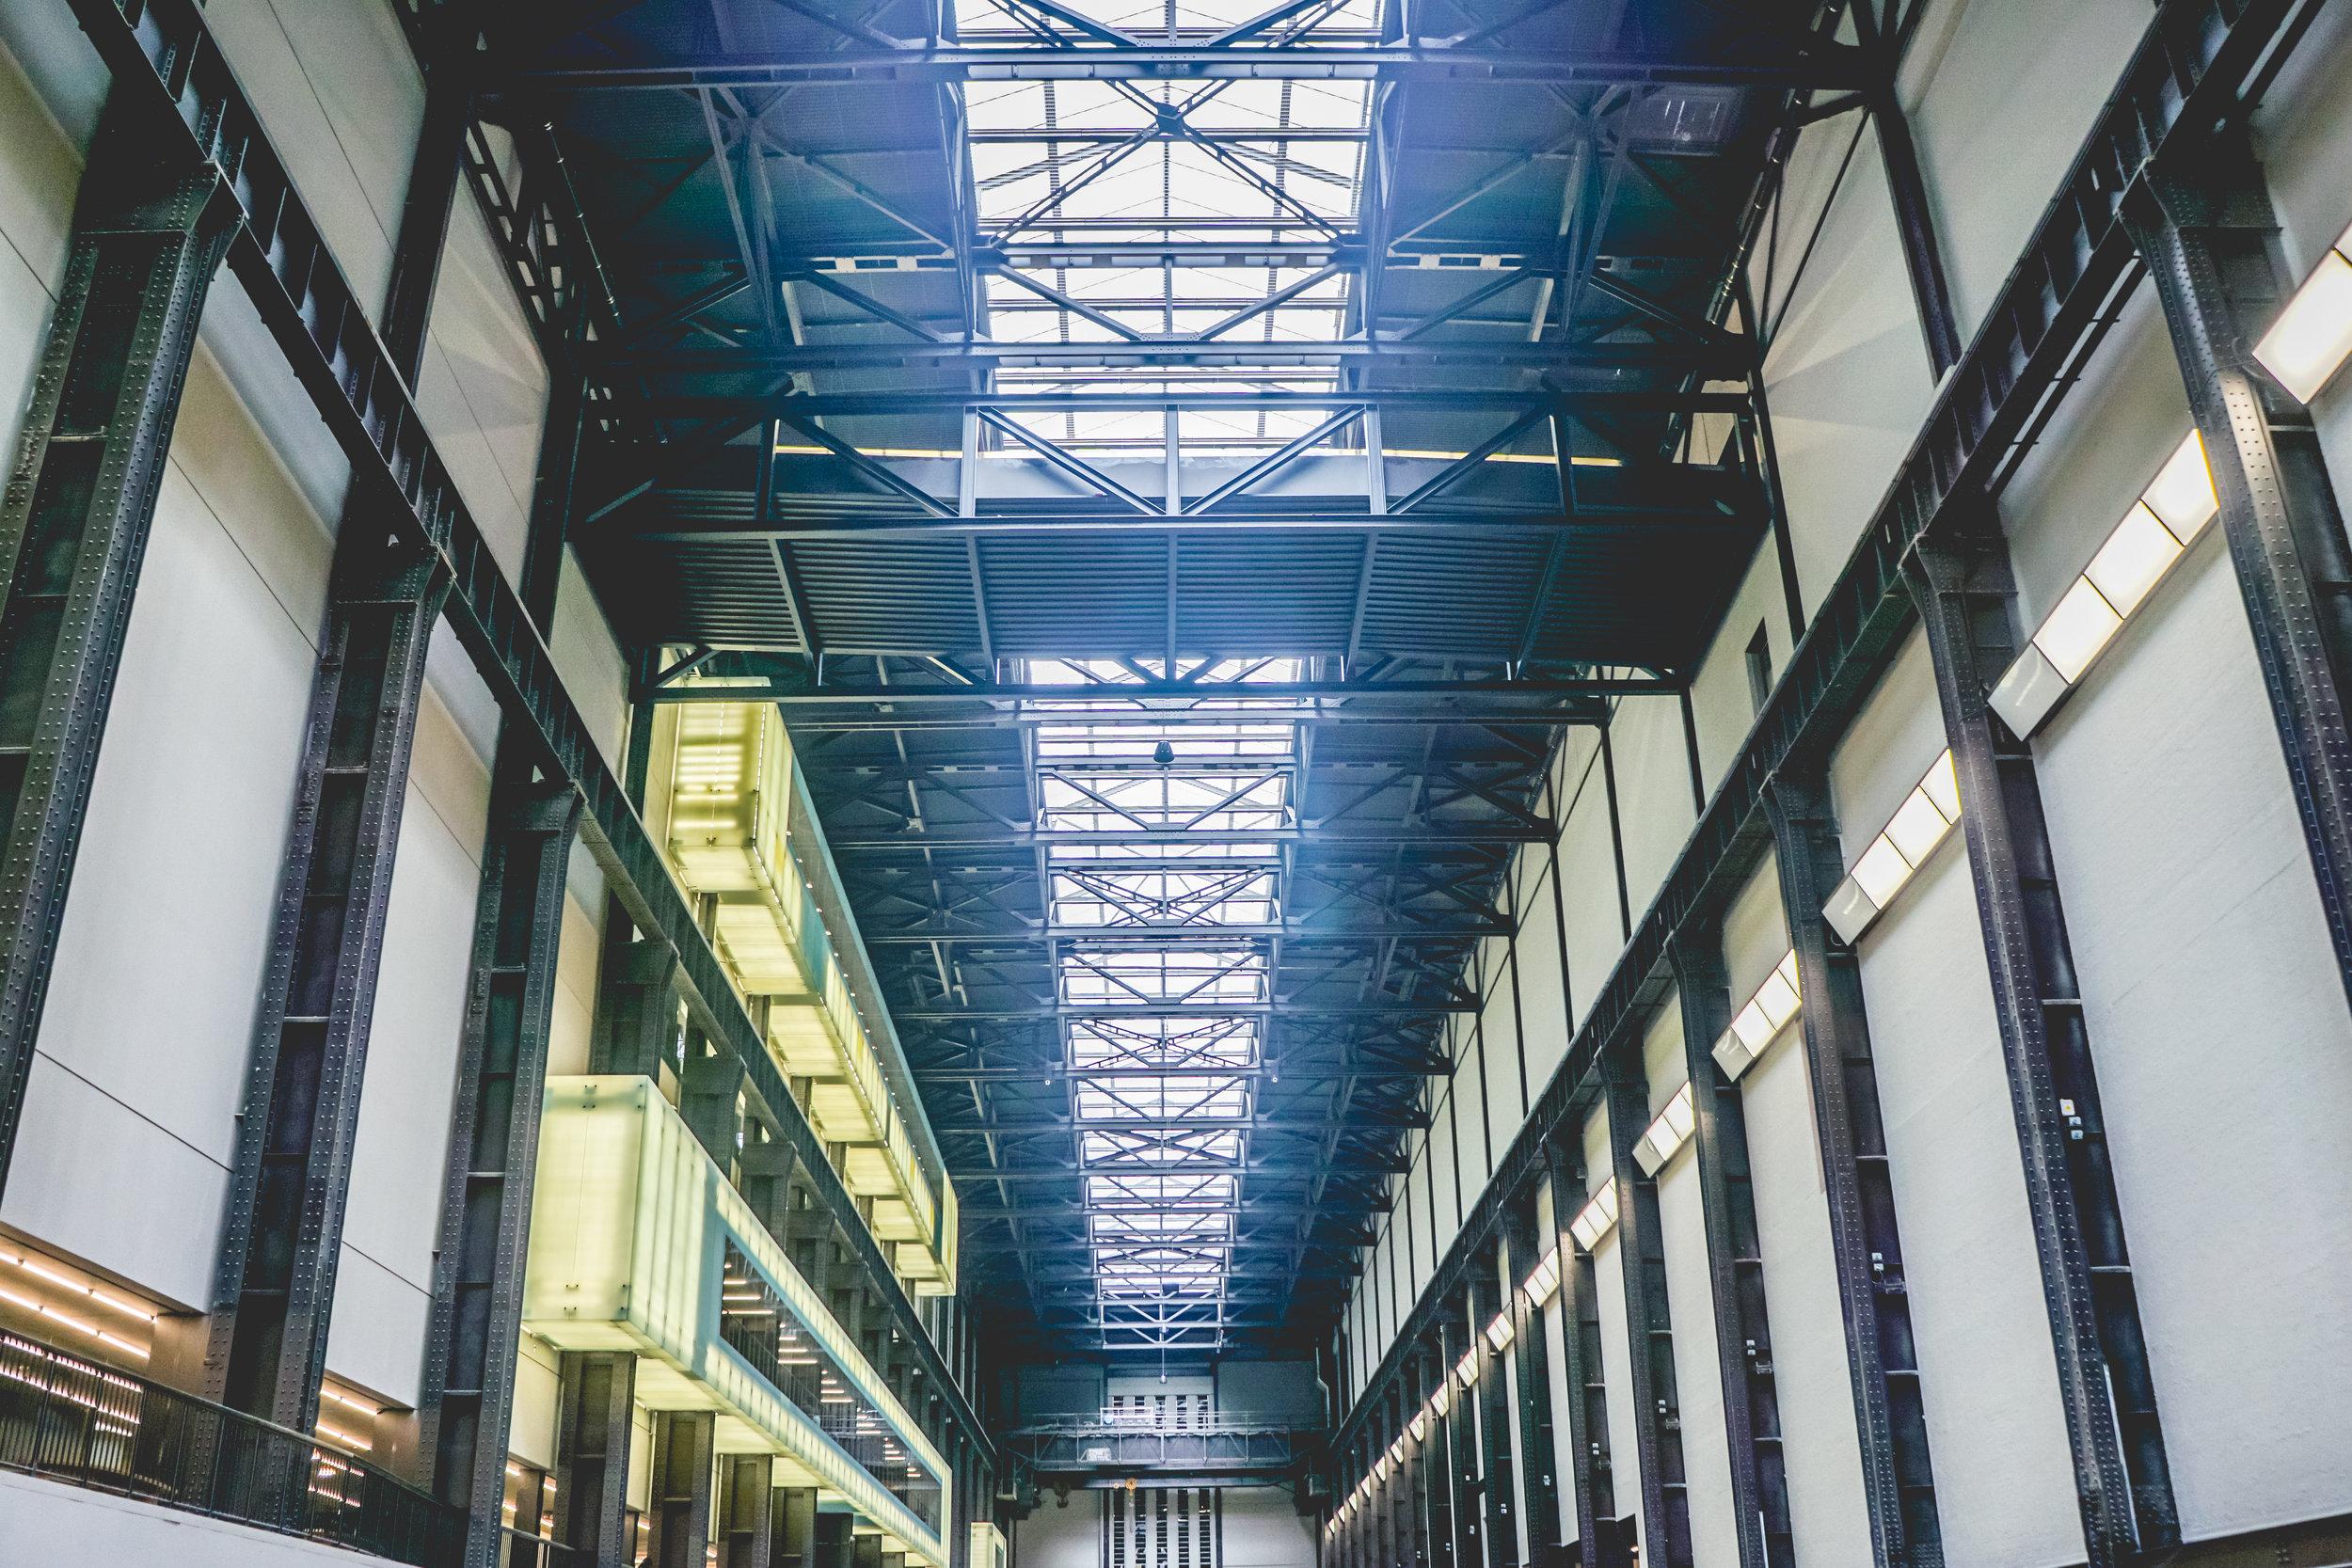 Inside the Tate